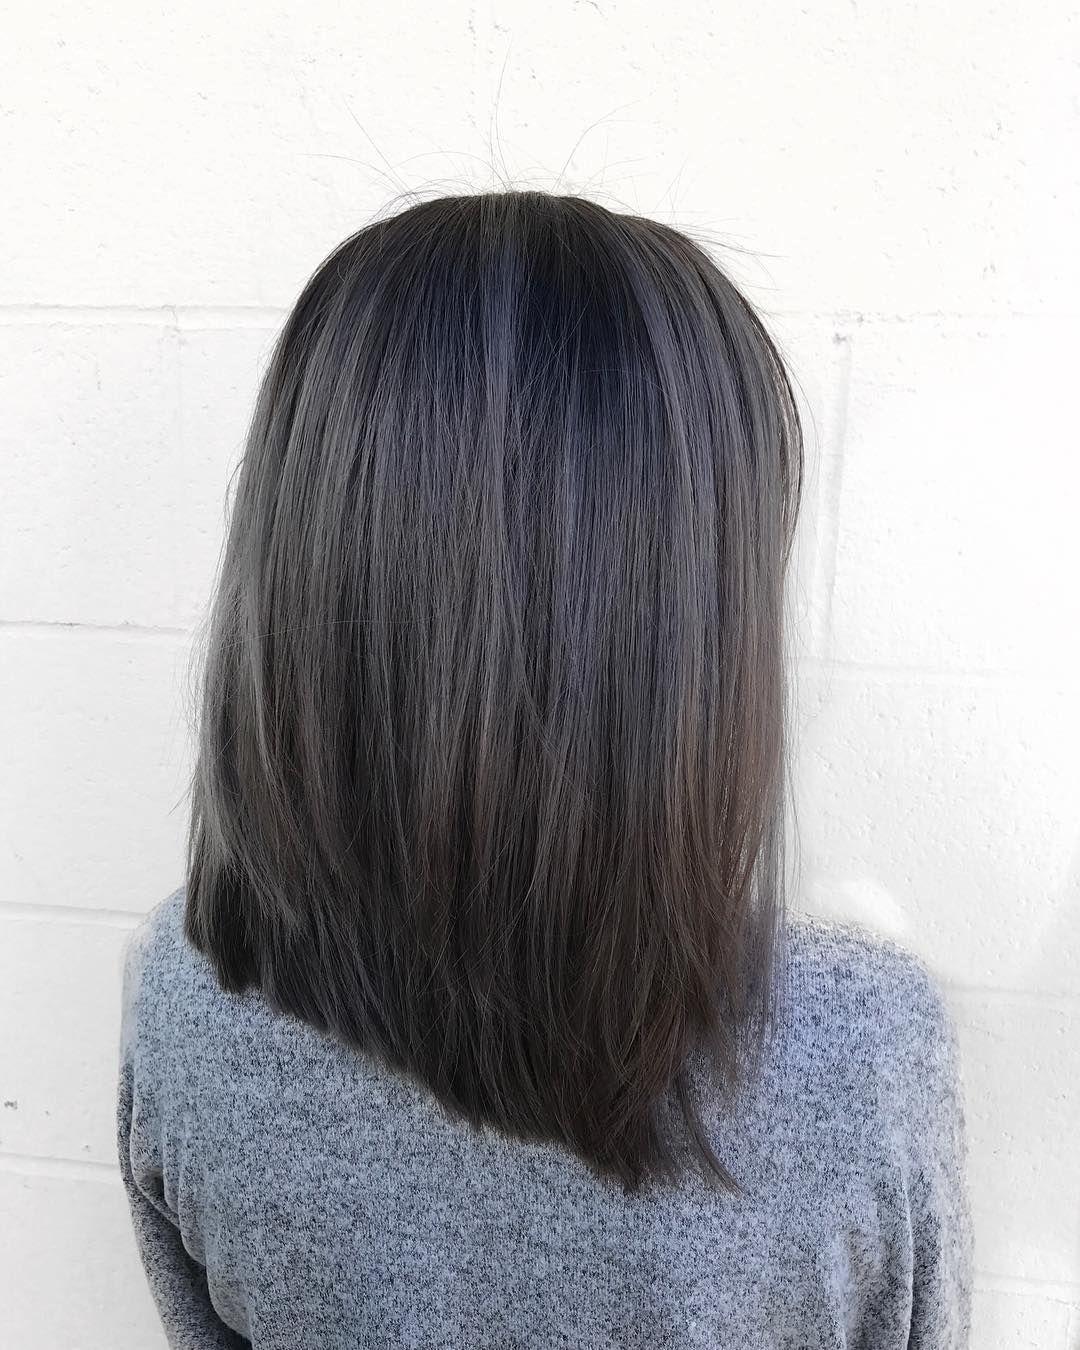 10 Super Pretty Anti Unicorn Charcoal Hairstyles As Dark As Your Soul Hair Styles Charcoal Hair Charcoal Grey Hair